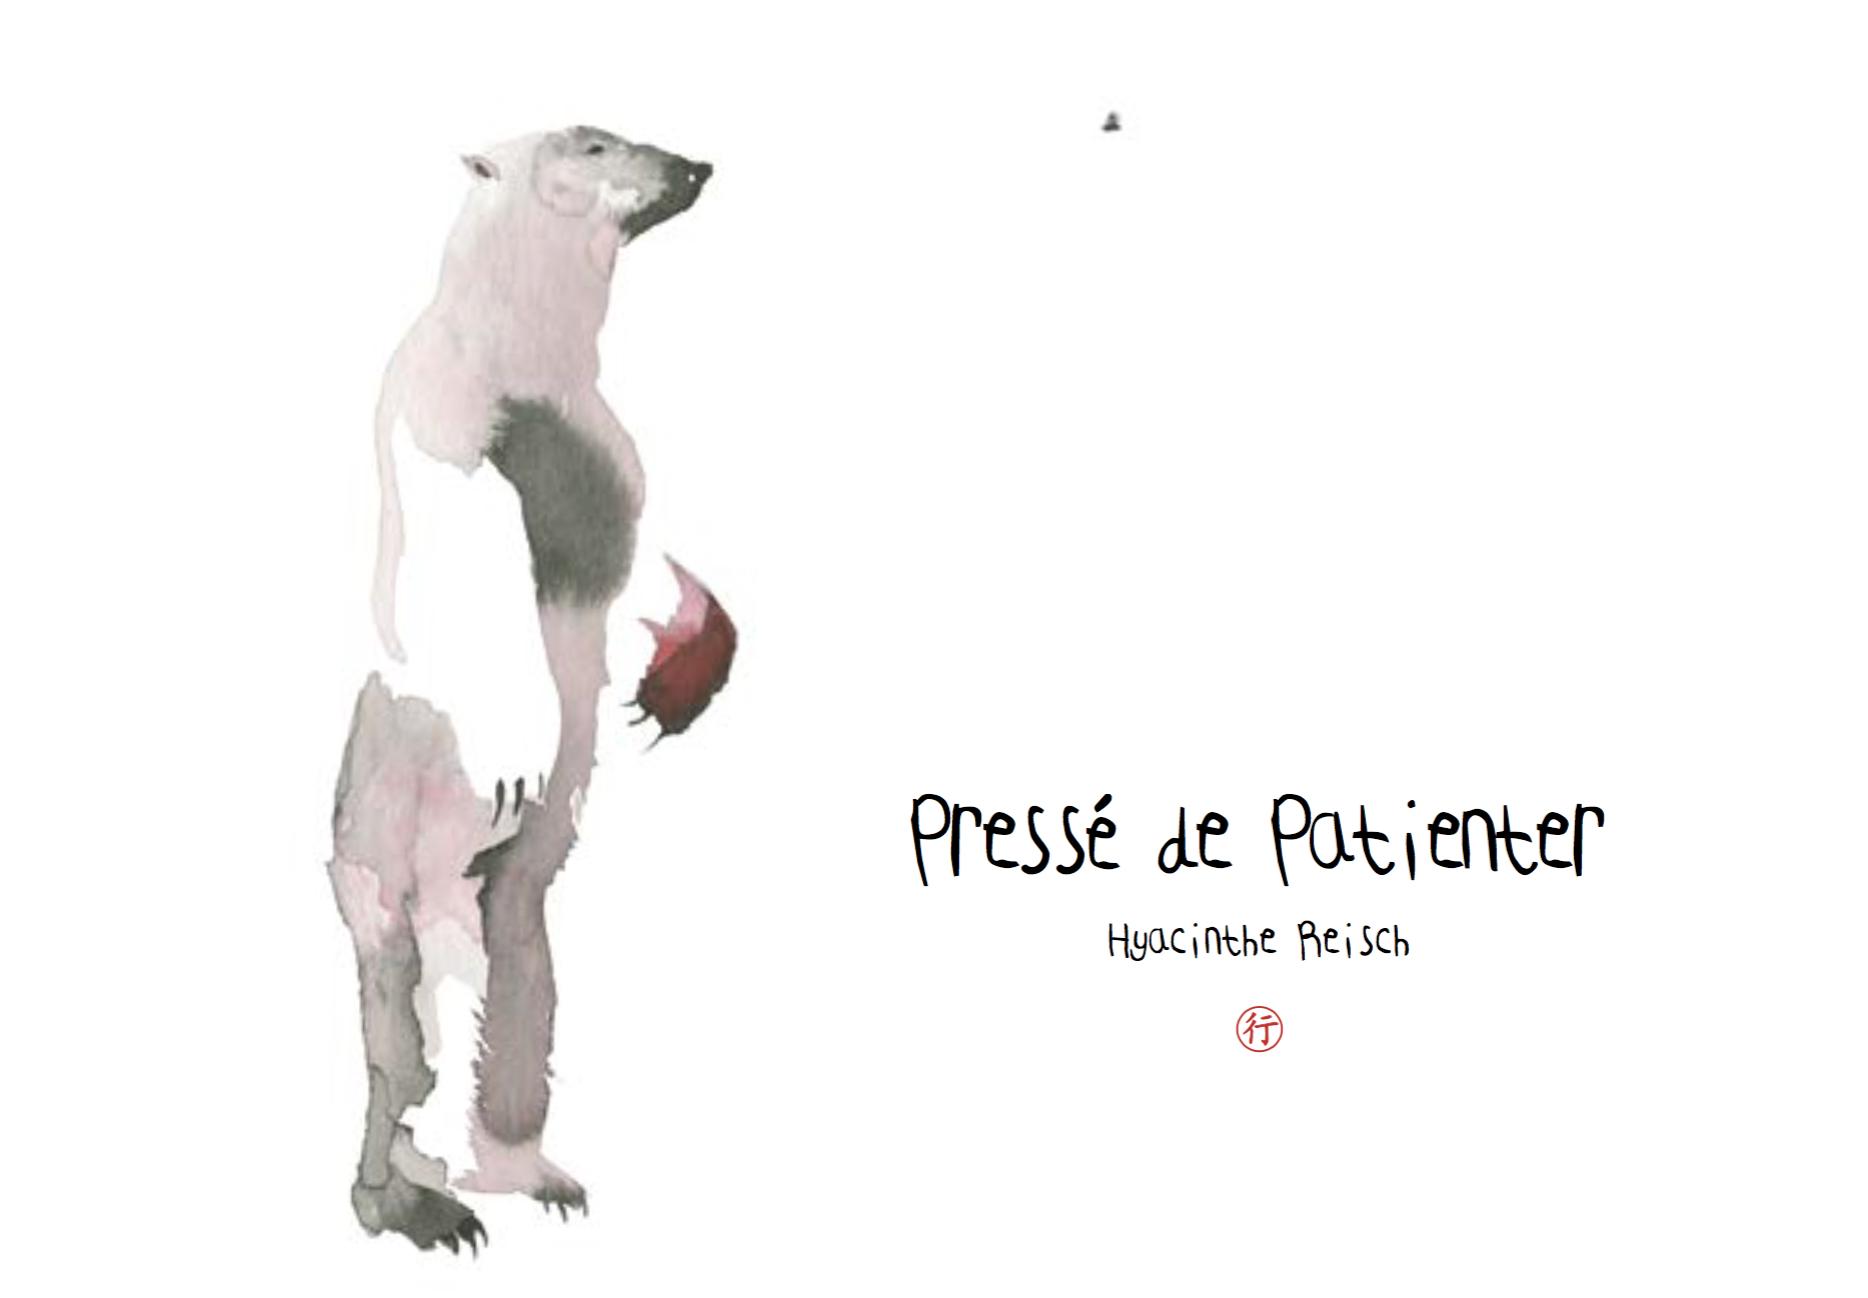 PRESSE DE PATIENTER